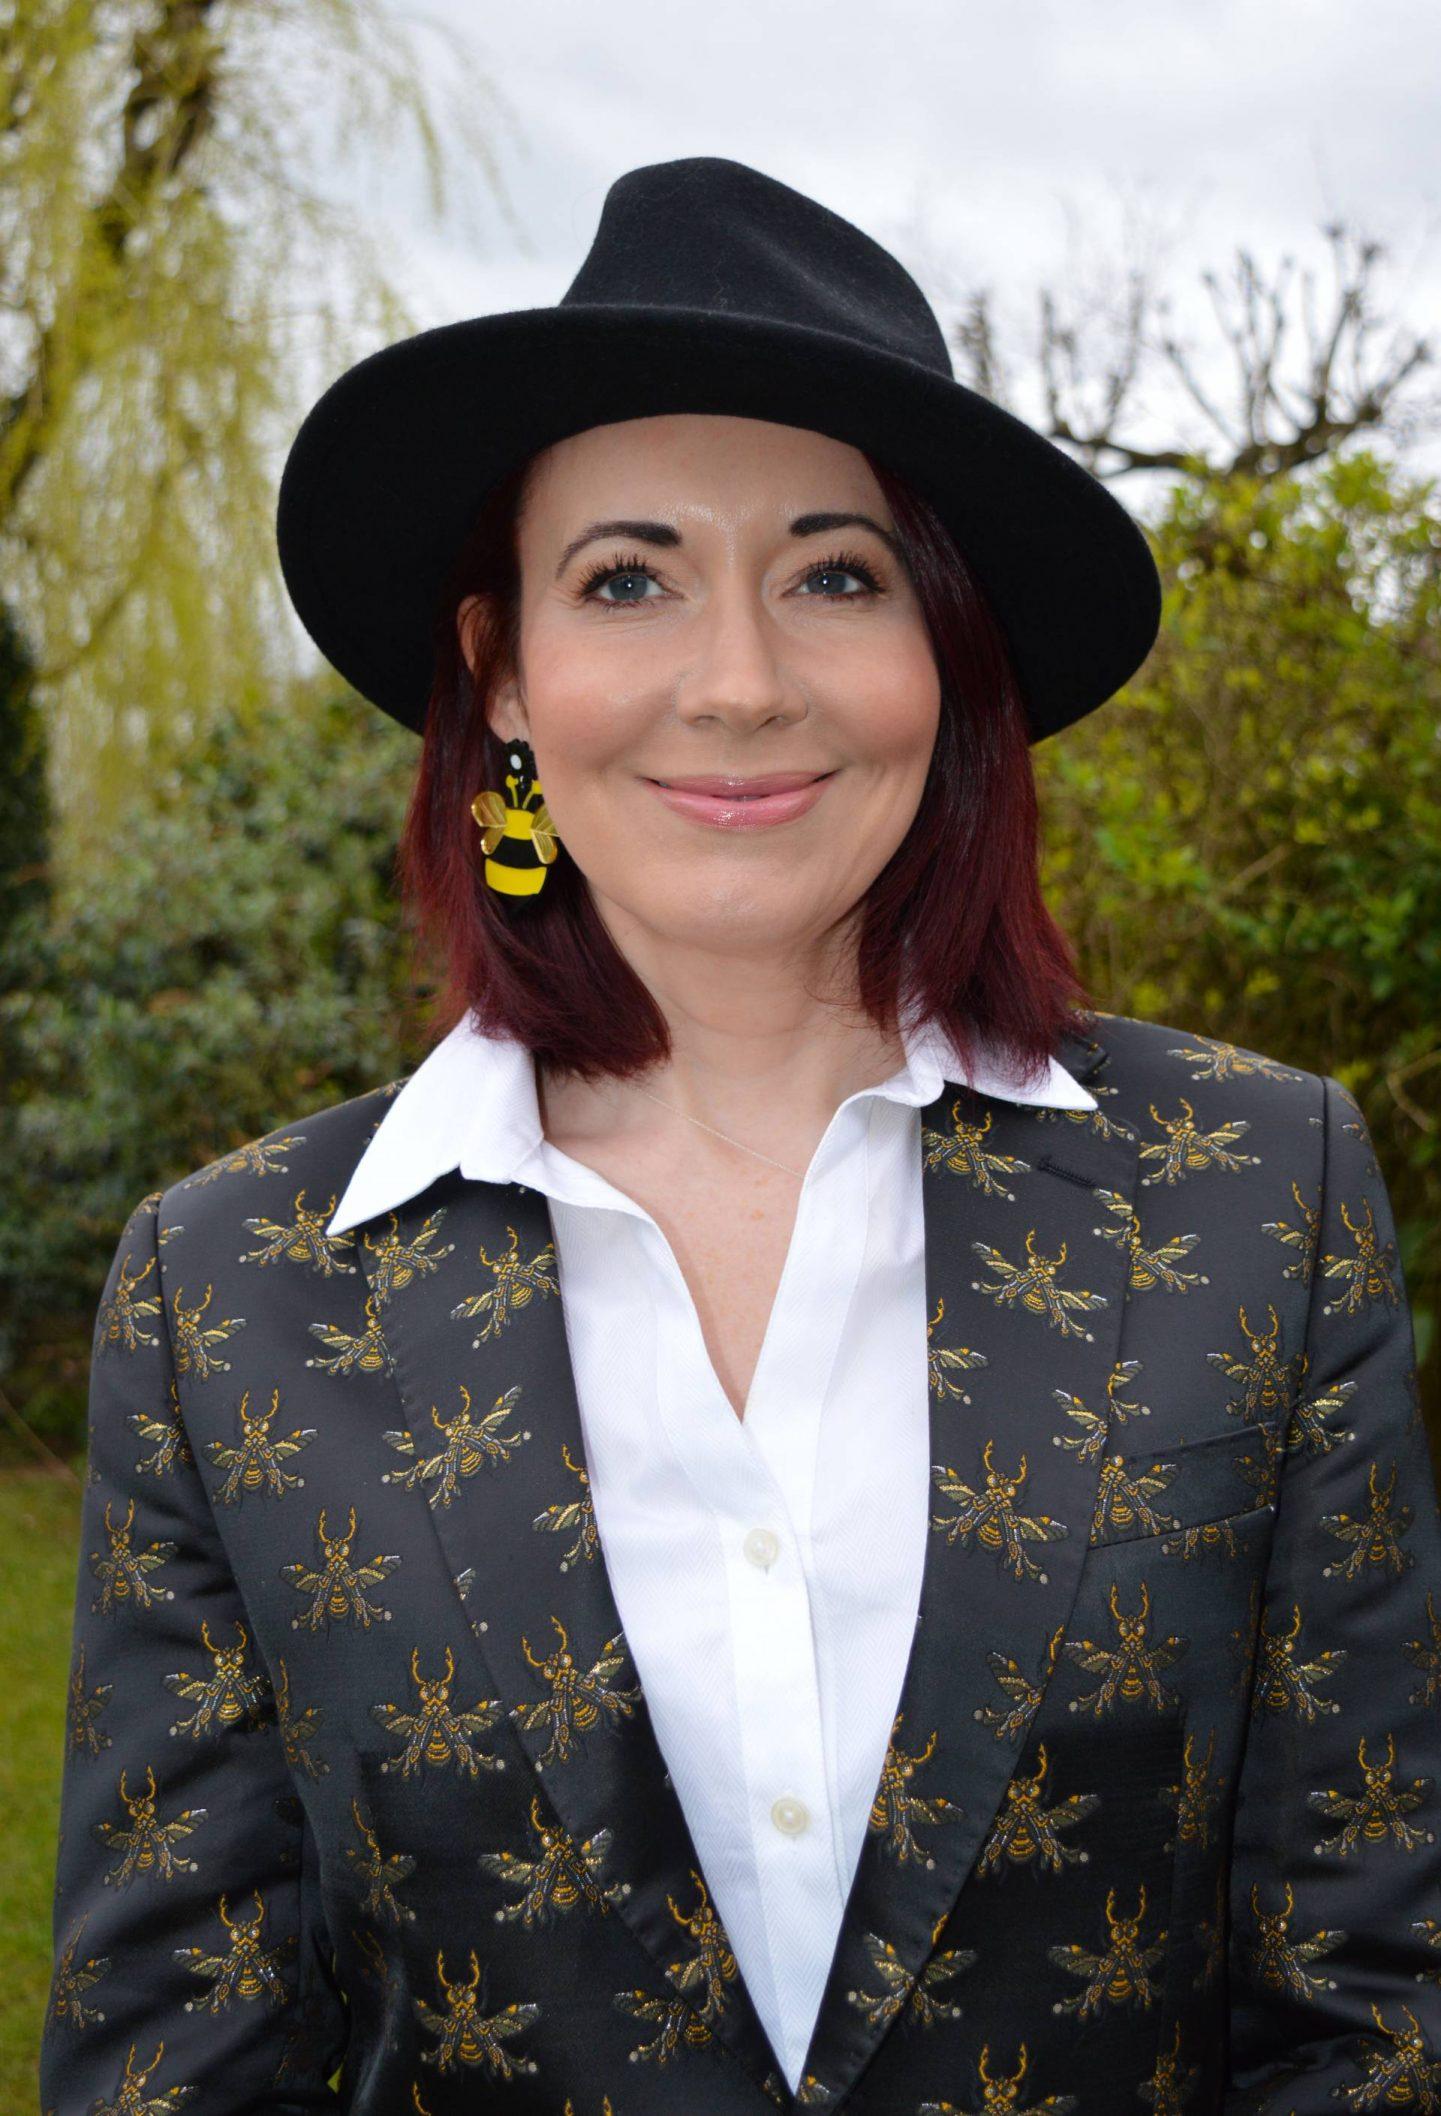 Borrowed From the Boys, Devil's Advocate bee embroidered blazer, Tibi tuxedo trousers, Zara black fedora, Modalu black studded satchel